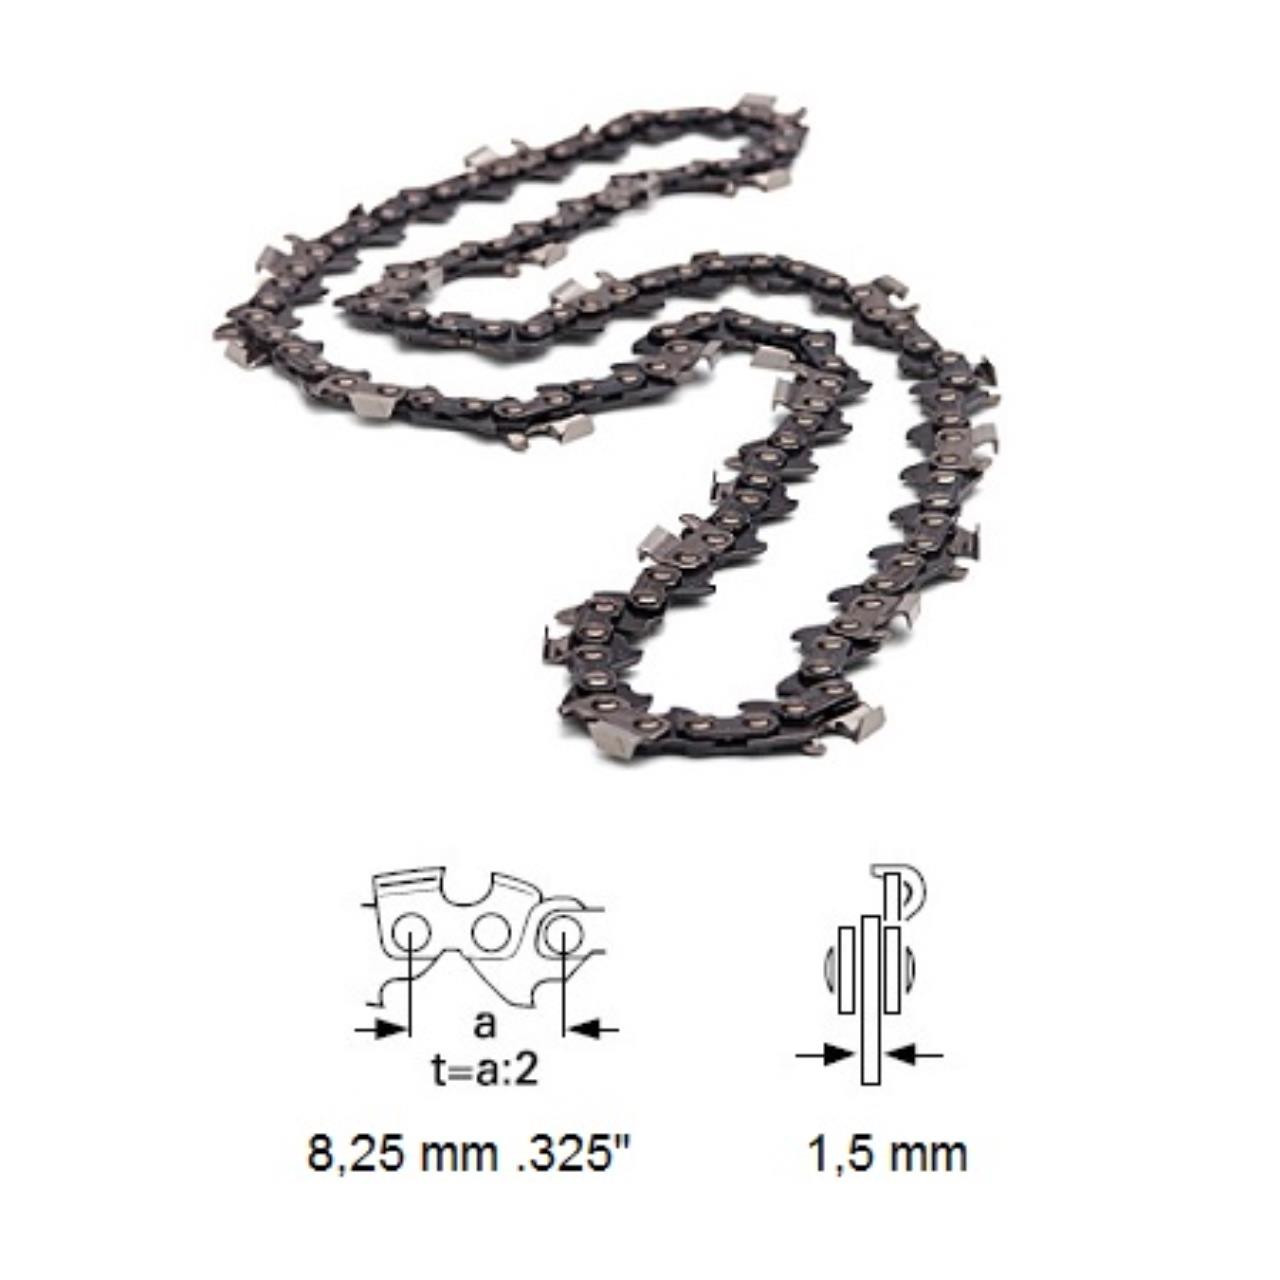 "Husqvarna savkæde .325"", 1,5 mm, halvmejsel"